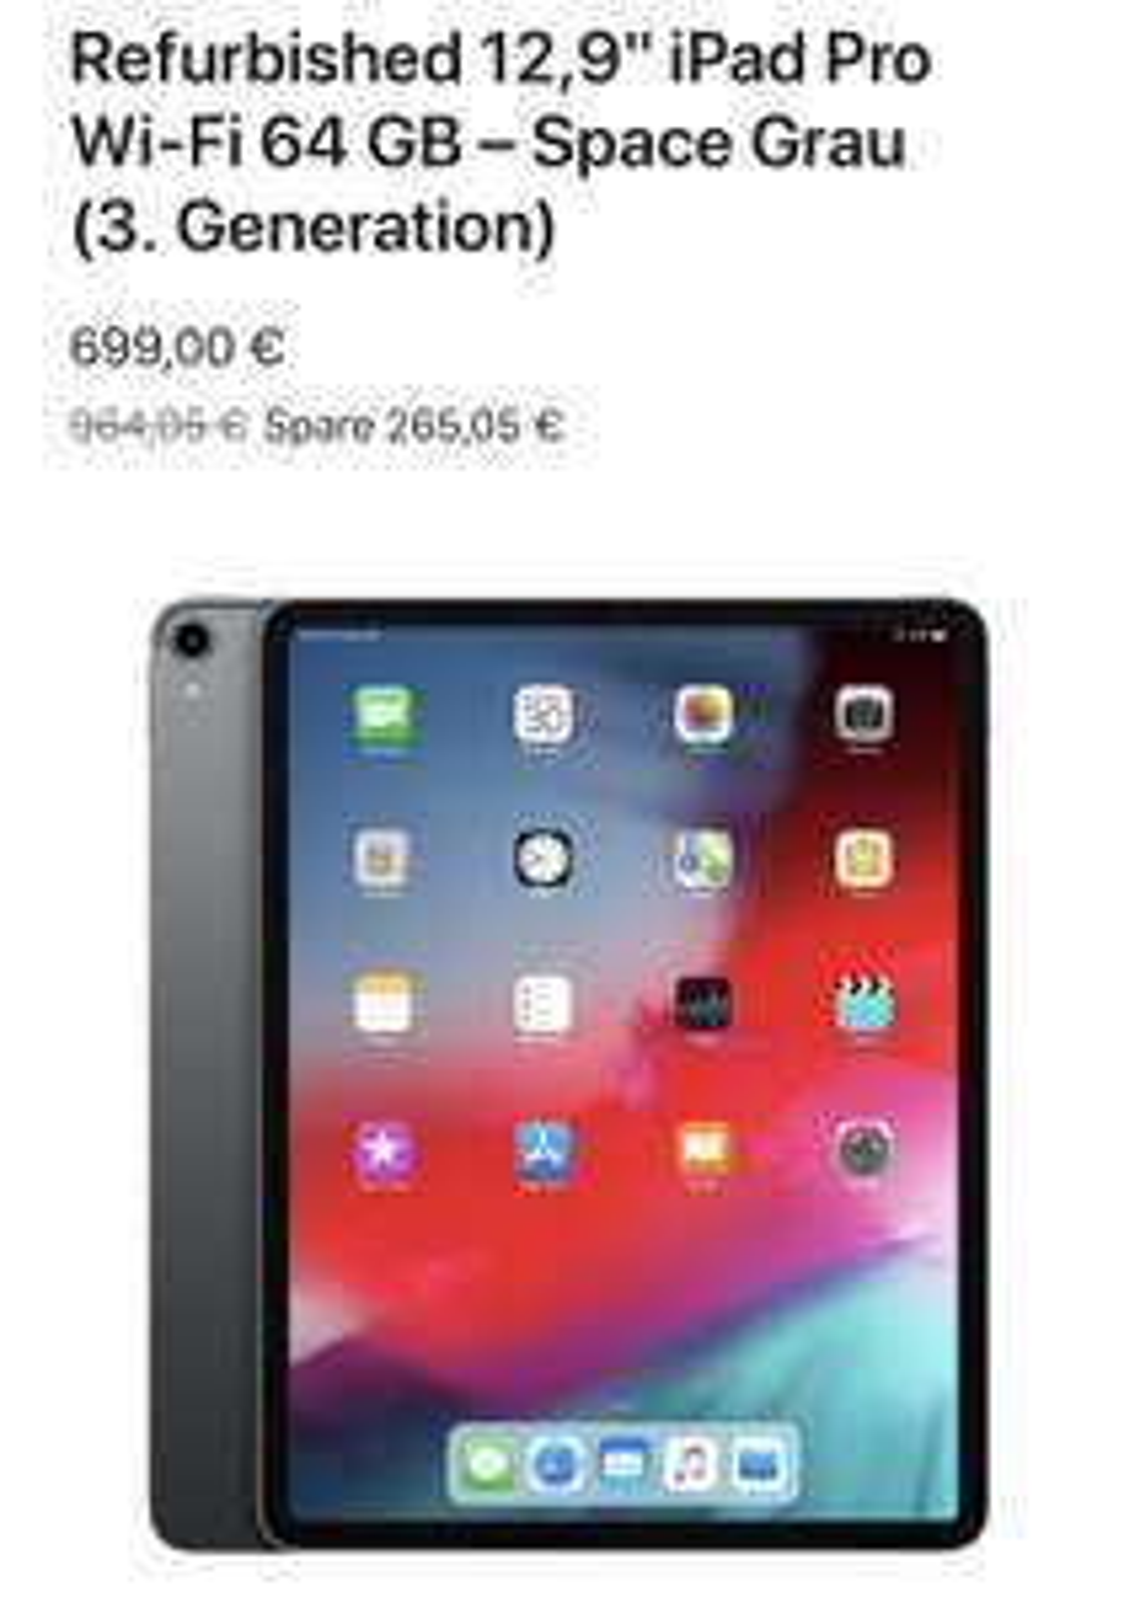 Apple zertifiziert refurbished iPad: iPad Pro 2018 12.9